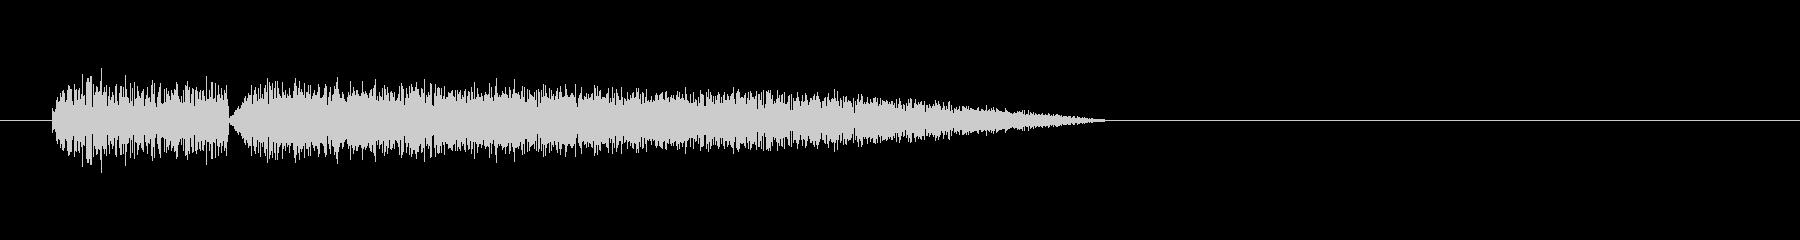 8bitの水音 ザパーンの未再生の波形